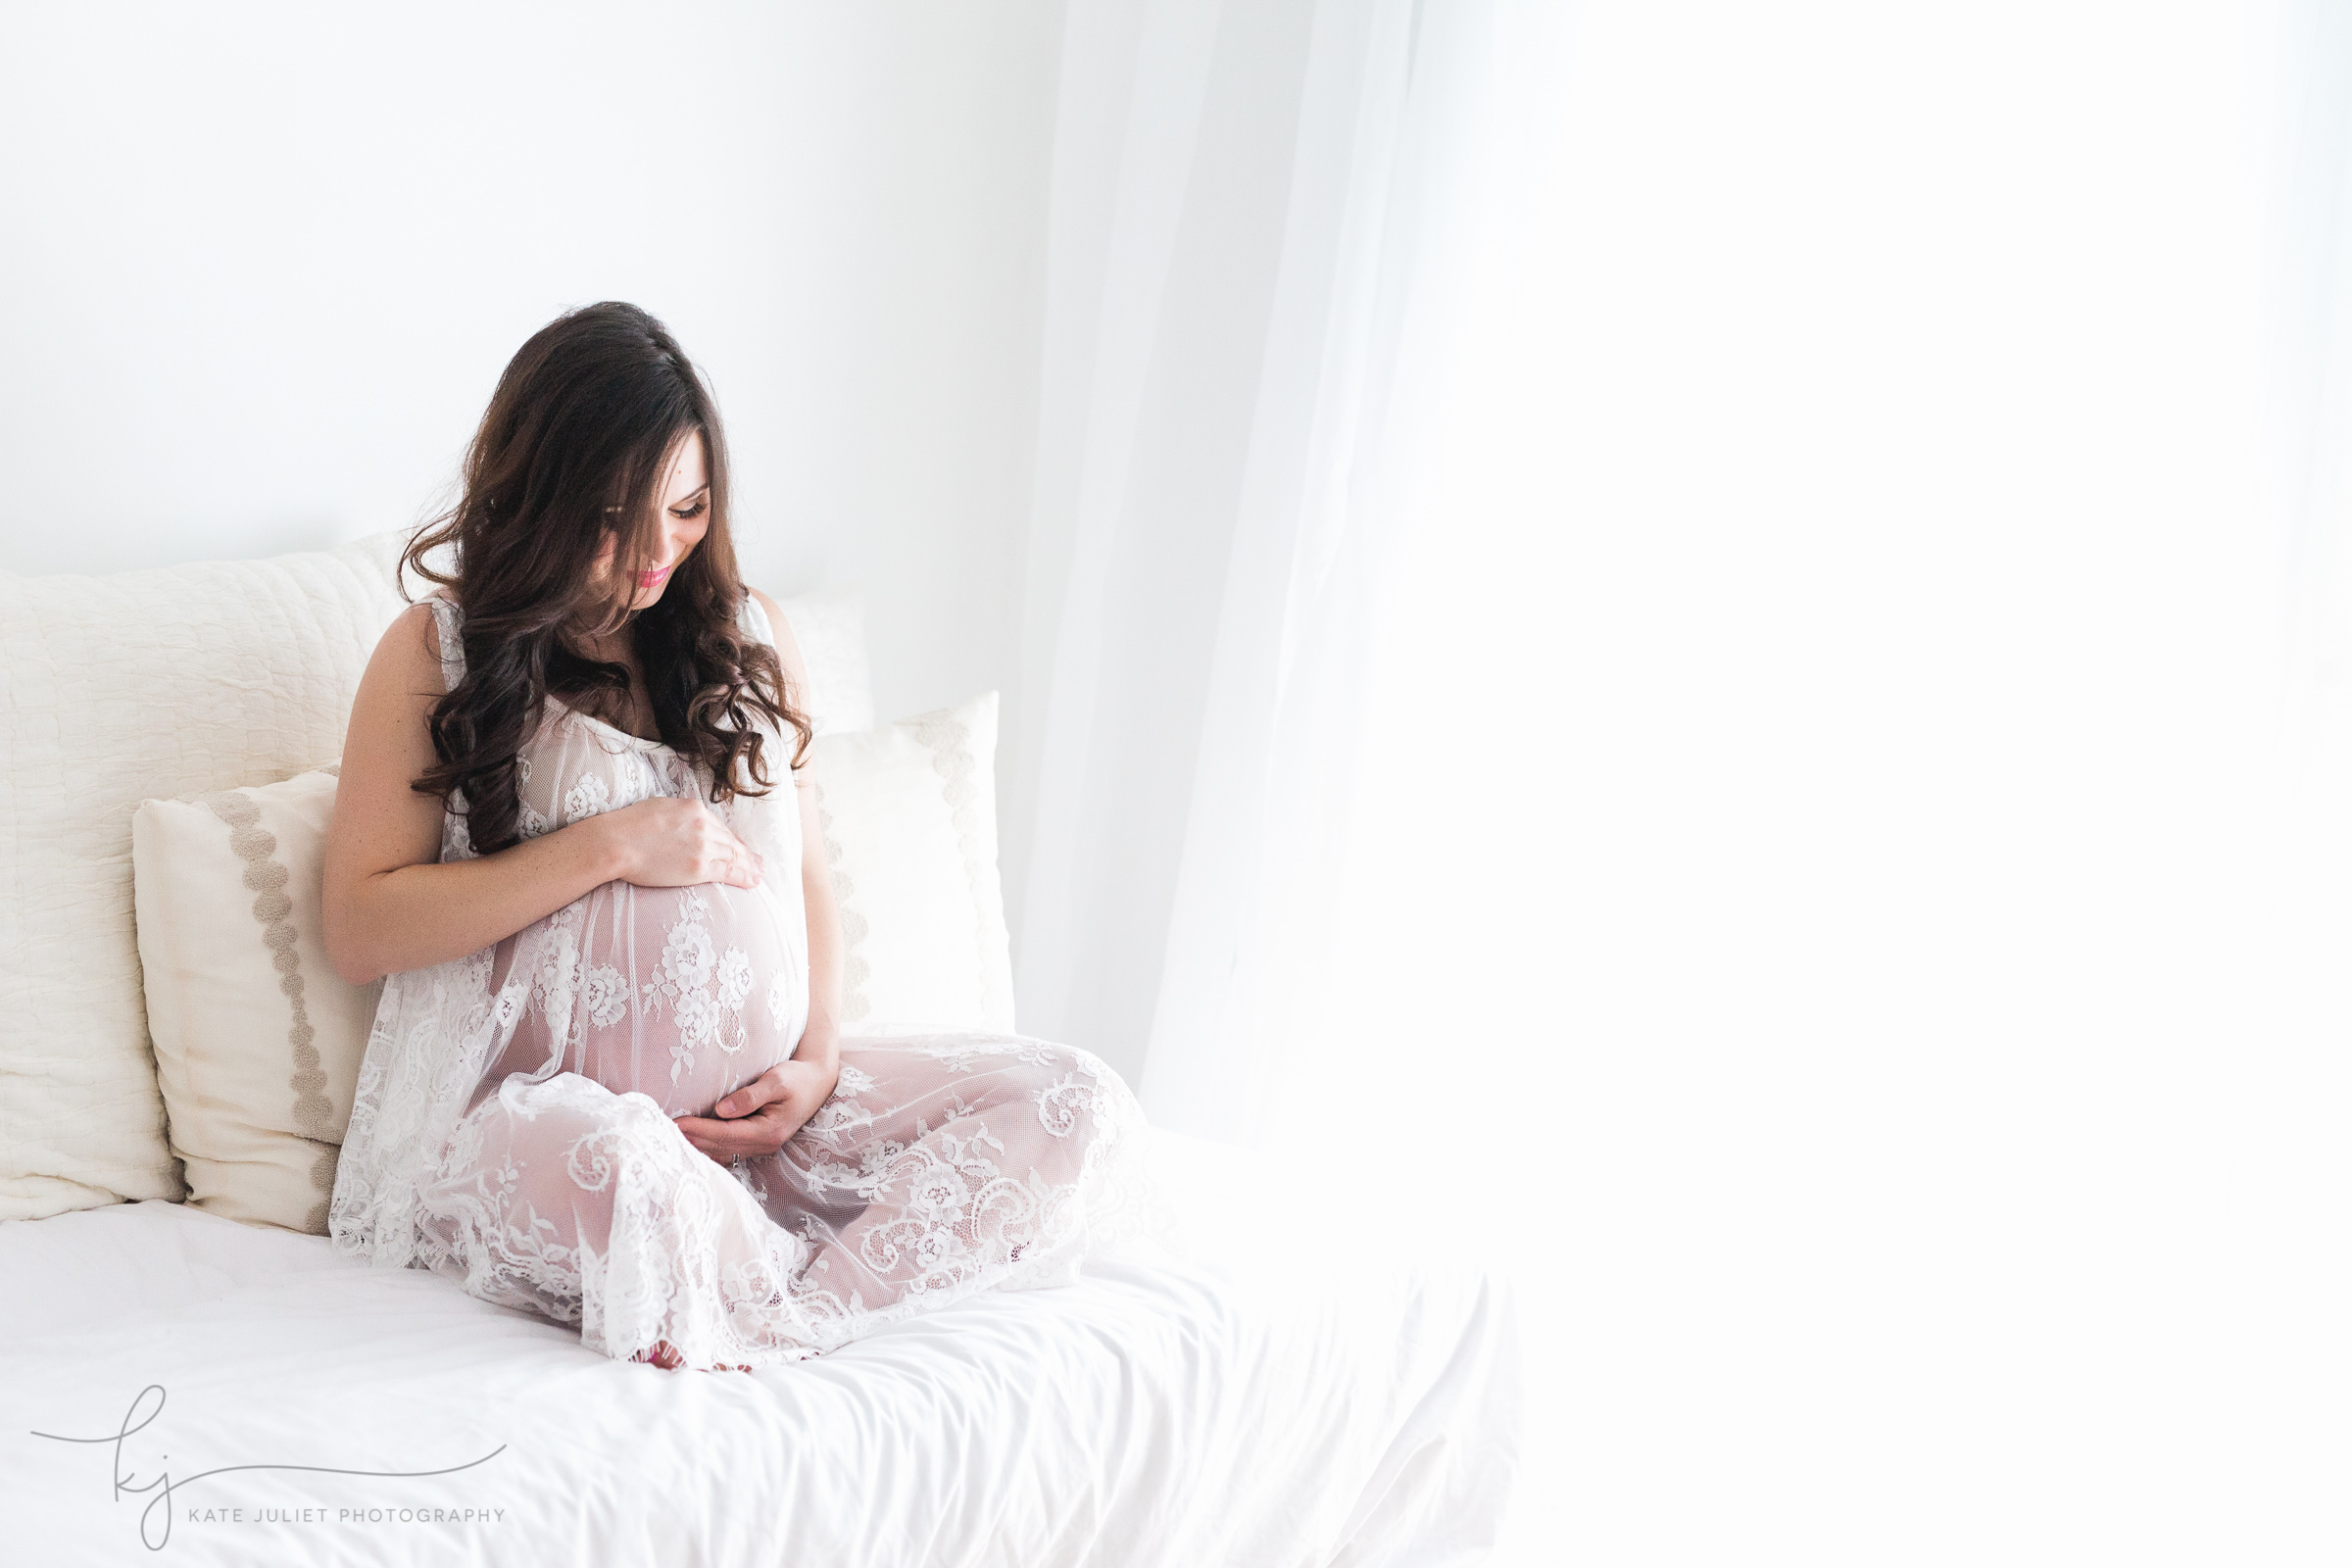 kate_juliet_photography_maternity_nova_rosell_web-011.jpg